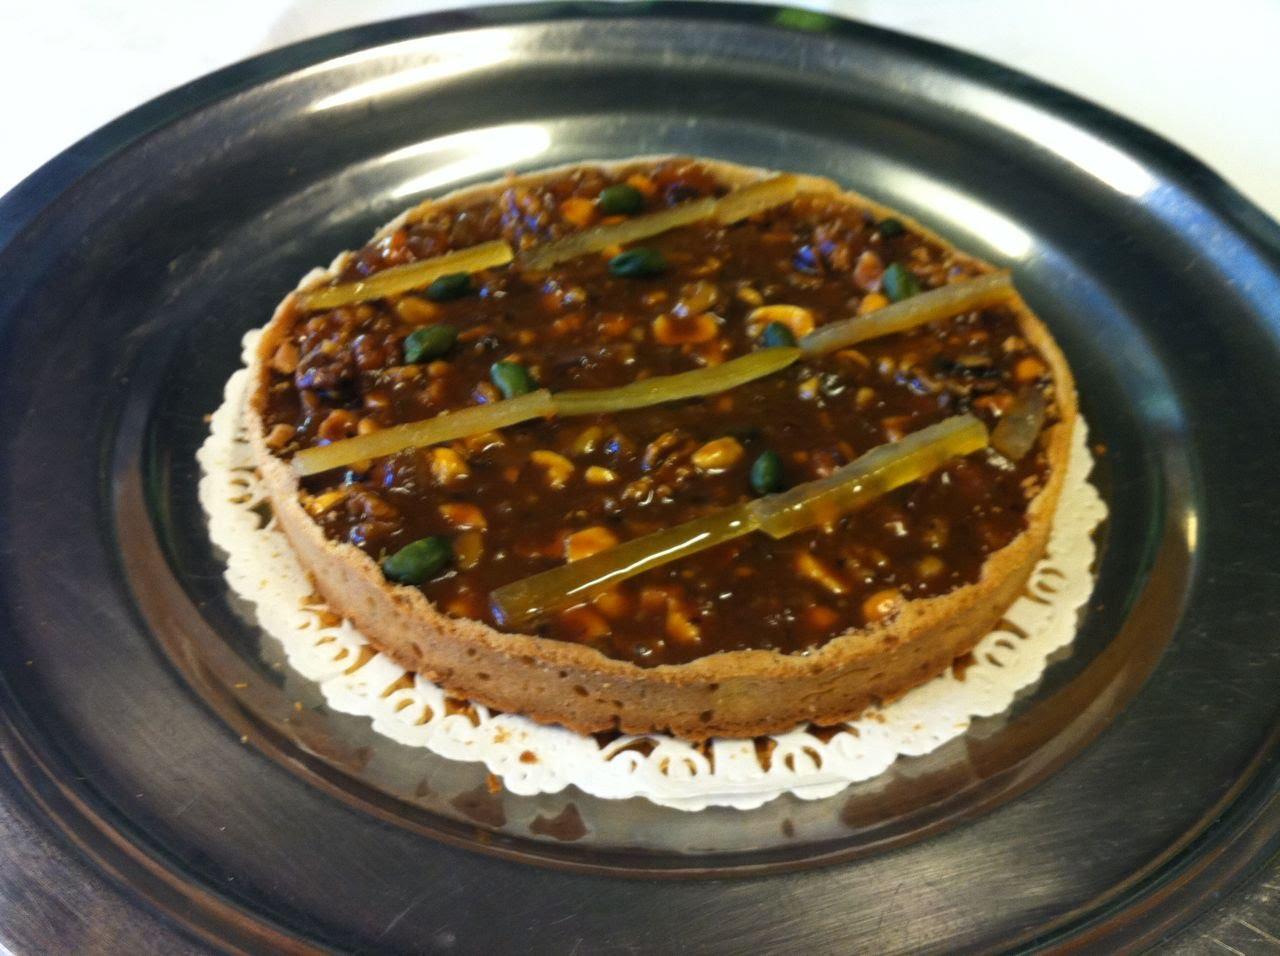 Tartelette aux fruits secs caramélisés©